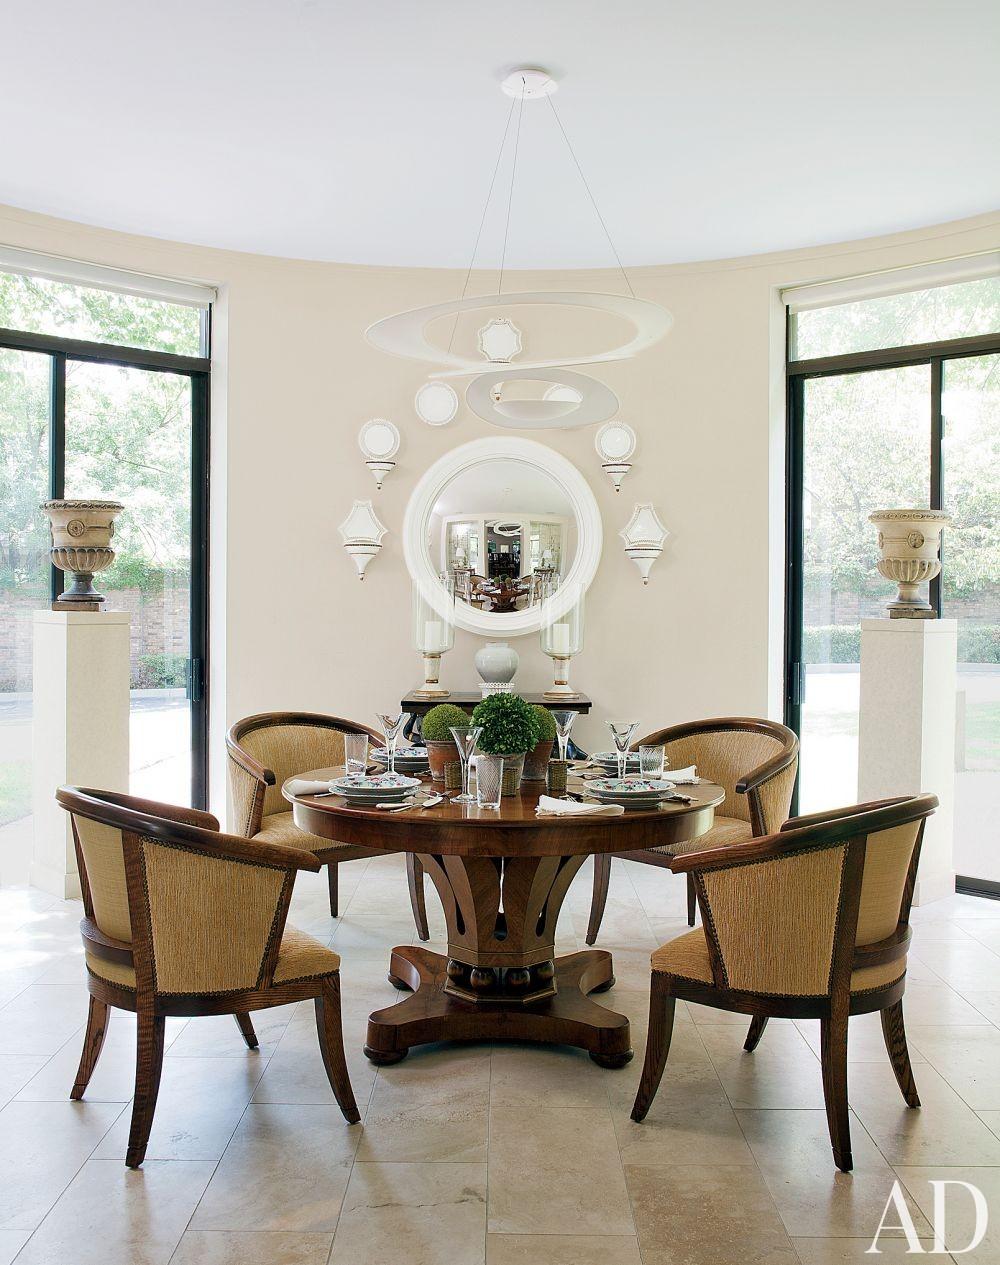 Traditional Dining Room by David Easton Inc. in Tulsa, Oklahoma